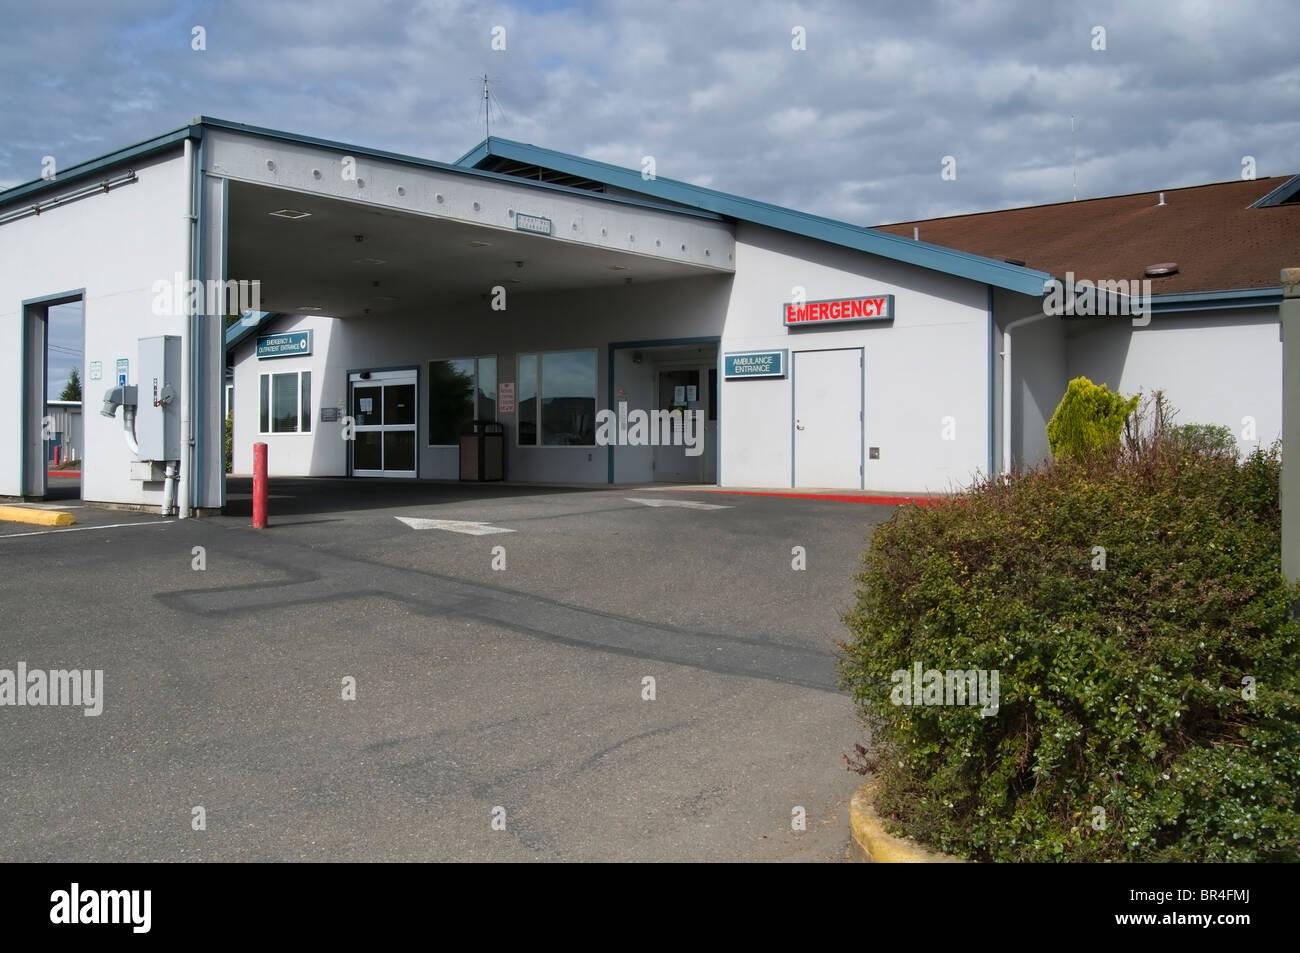 Emergency entrance to the Forks Community Hospital in Forks, Washington. - Stock Image